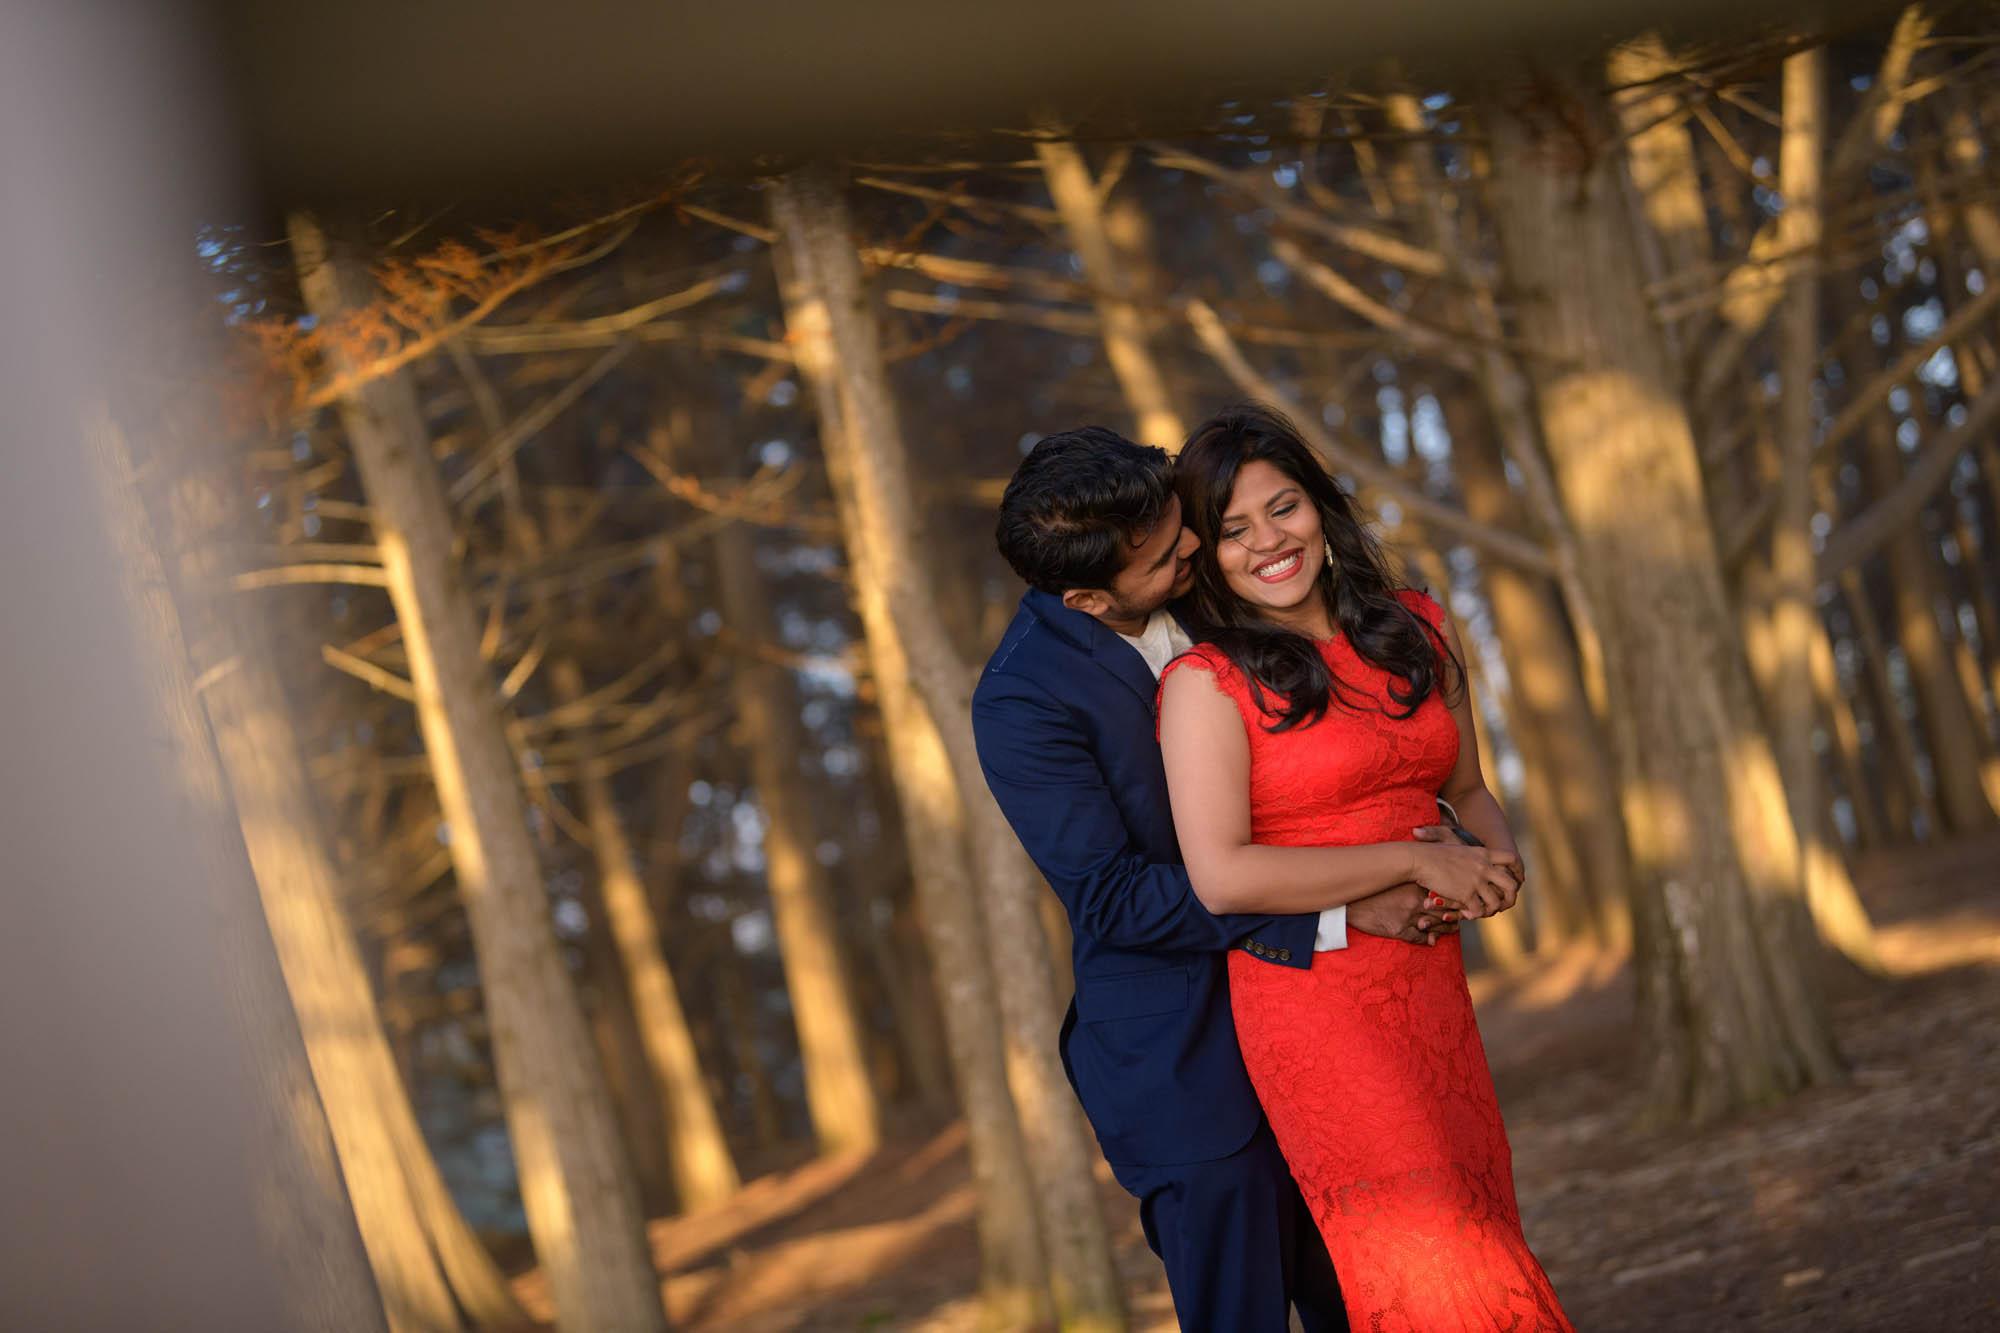 6890_Garima_and_Sushant_Fitzgerald_Marine_Reserve_Moss_Beach_Engagement_Photography.jpg